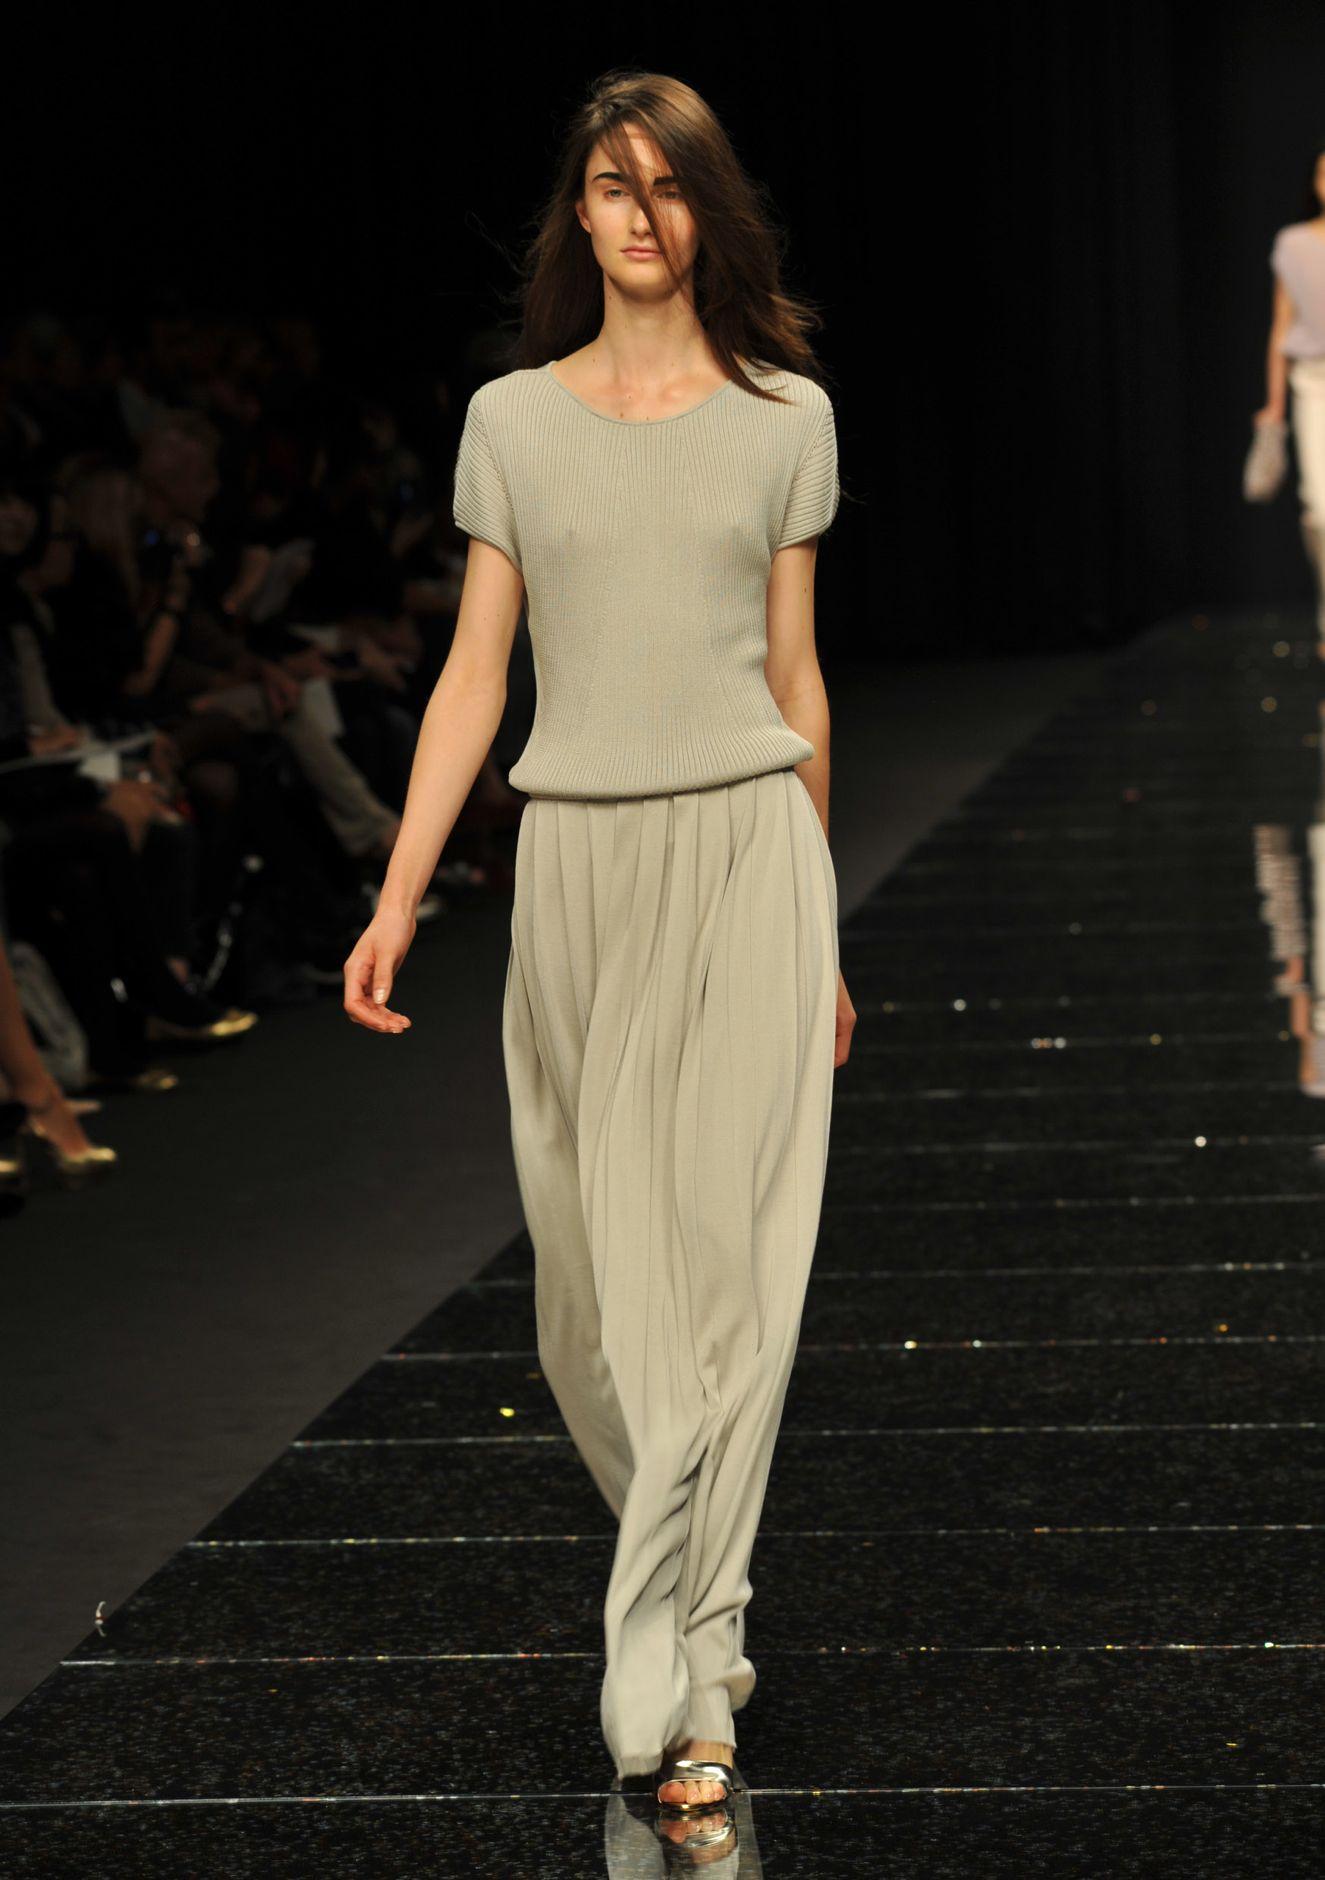 Anteprima Catwalk Milano Fashion Week